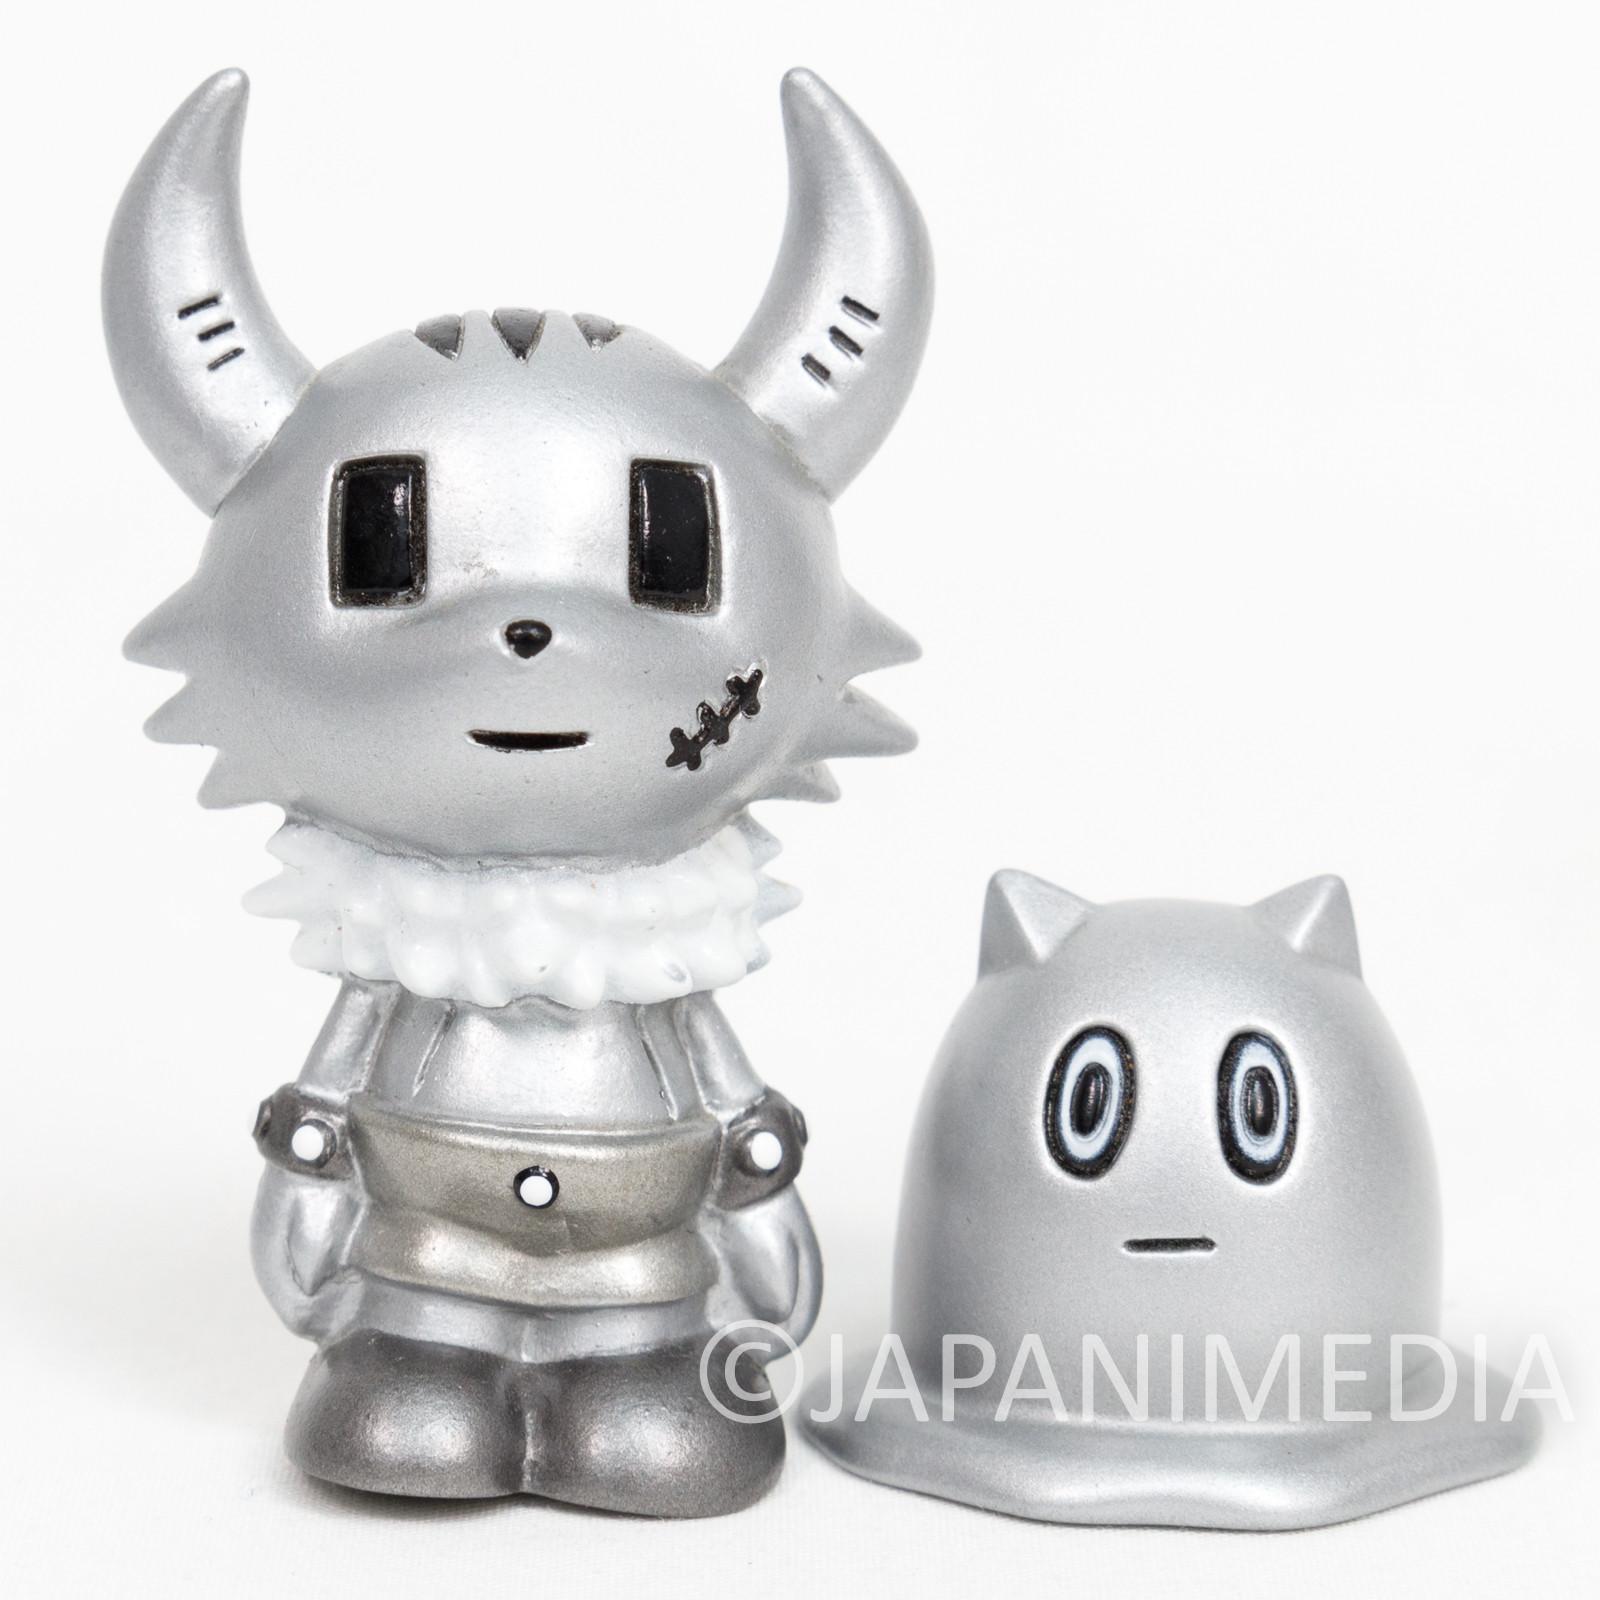 Ponkotsu Quest Plastic Kaku & Imura Finger Puppet Soft Vinyl Figure Silver ver.